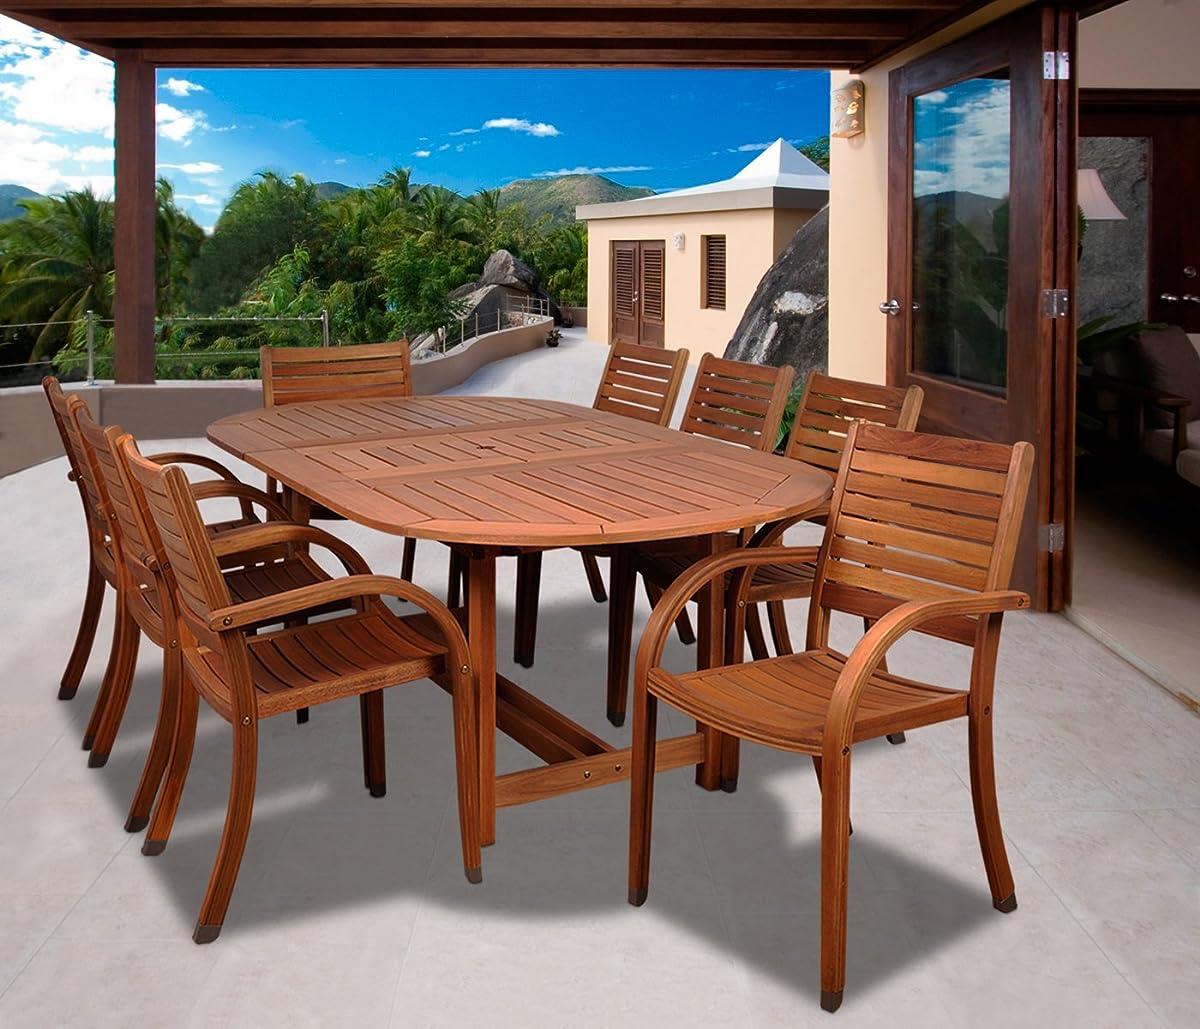 Amazonia Arizona 9-Piece Eucalyptus Oval Dining Set